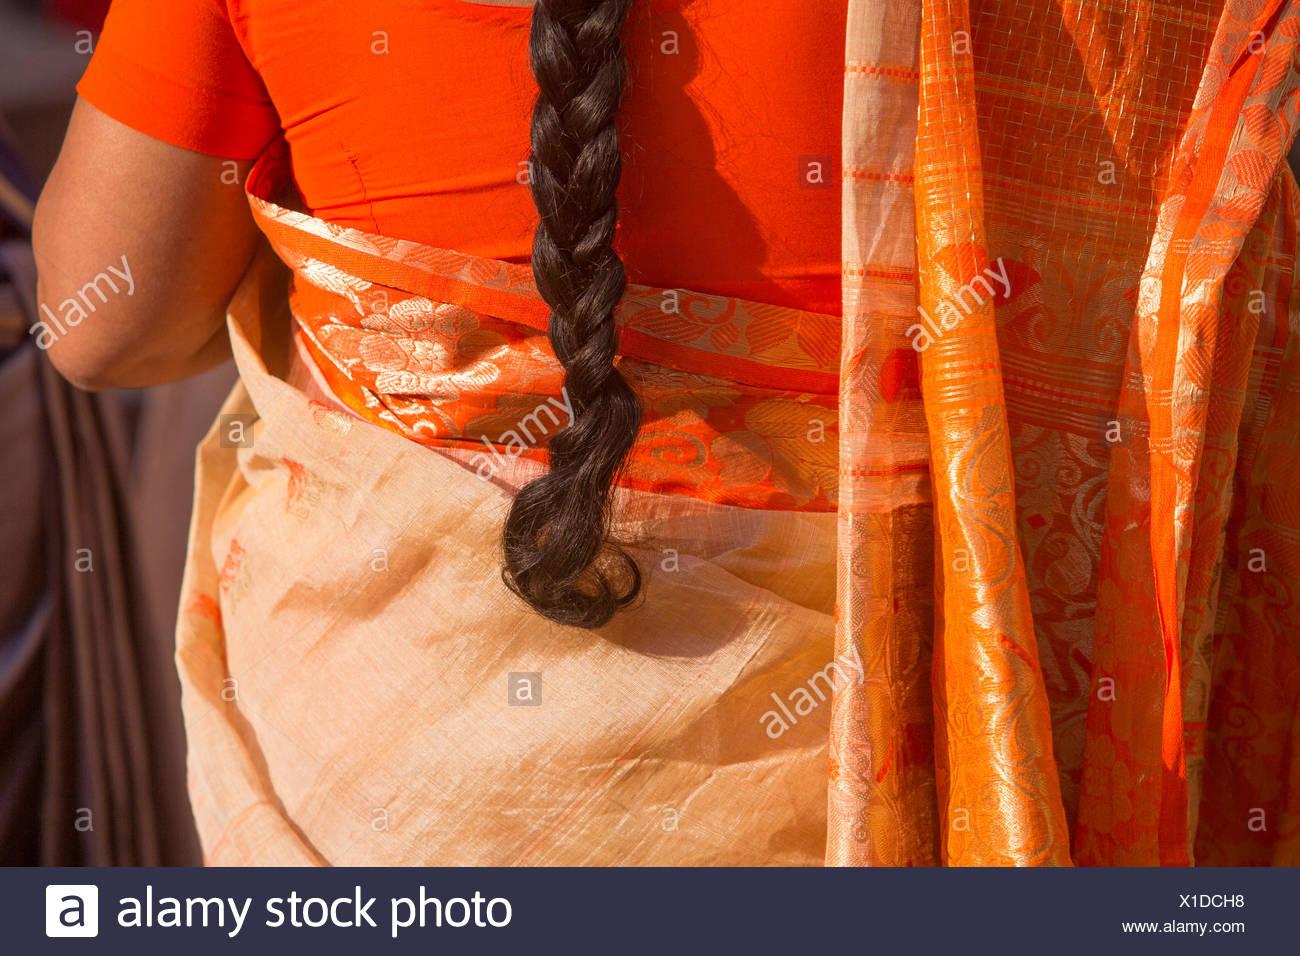 Indian, donna donne, India, sari, capelli, dettaglio, rosso, Asia, Rajasthan, Immagini Stock